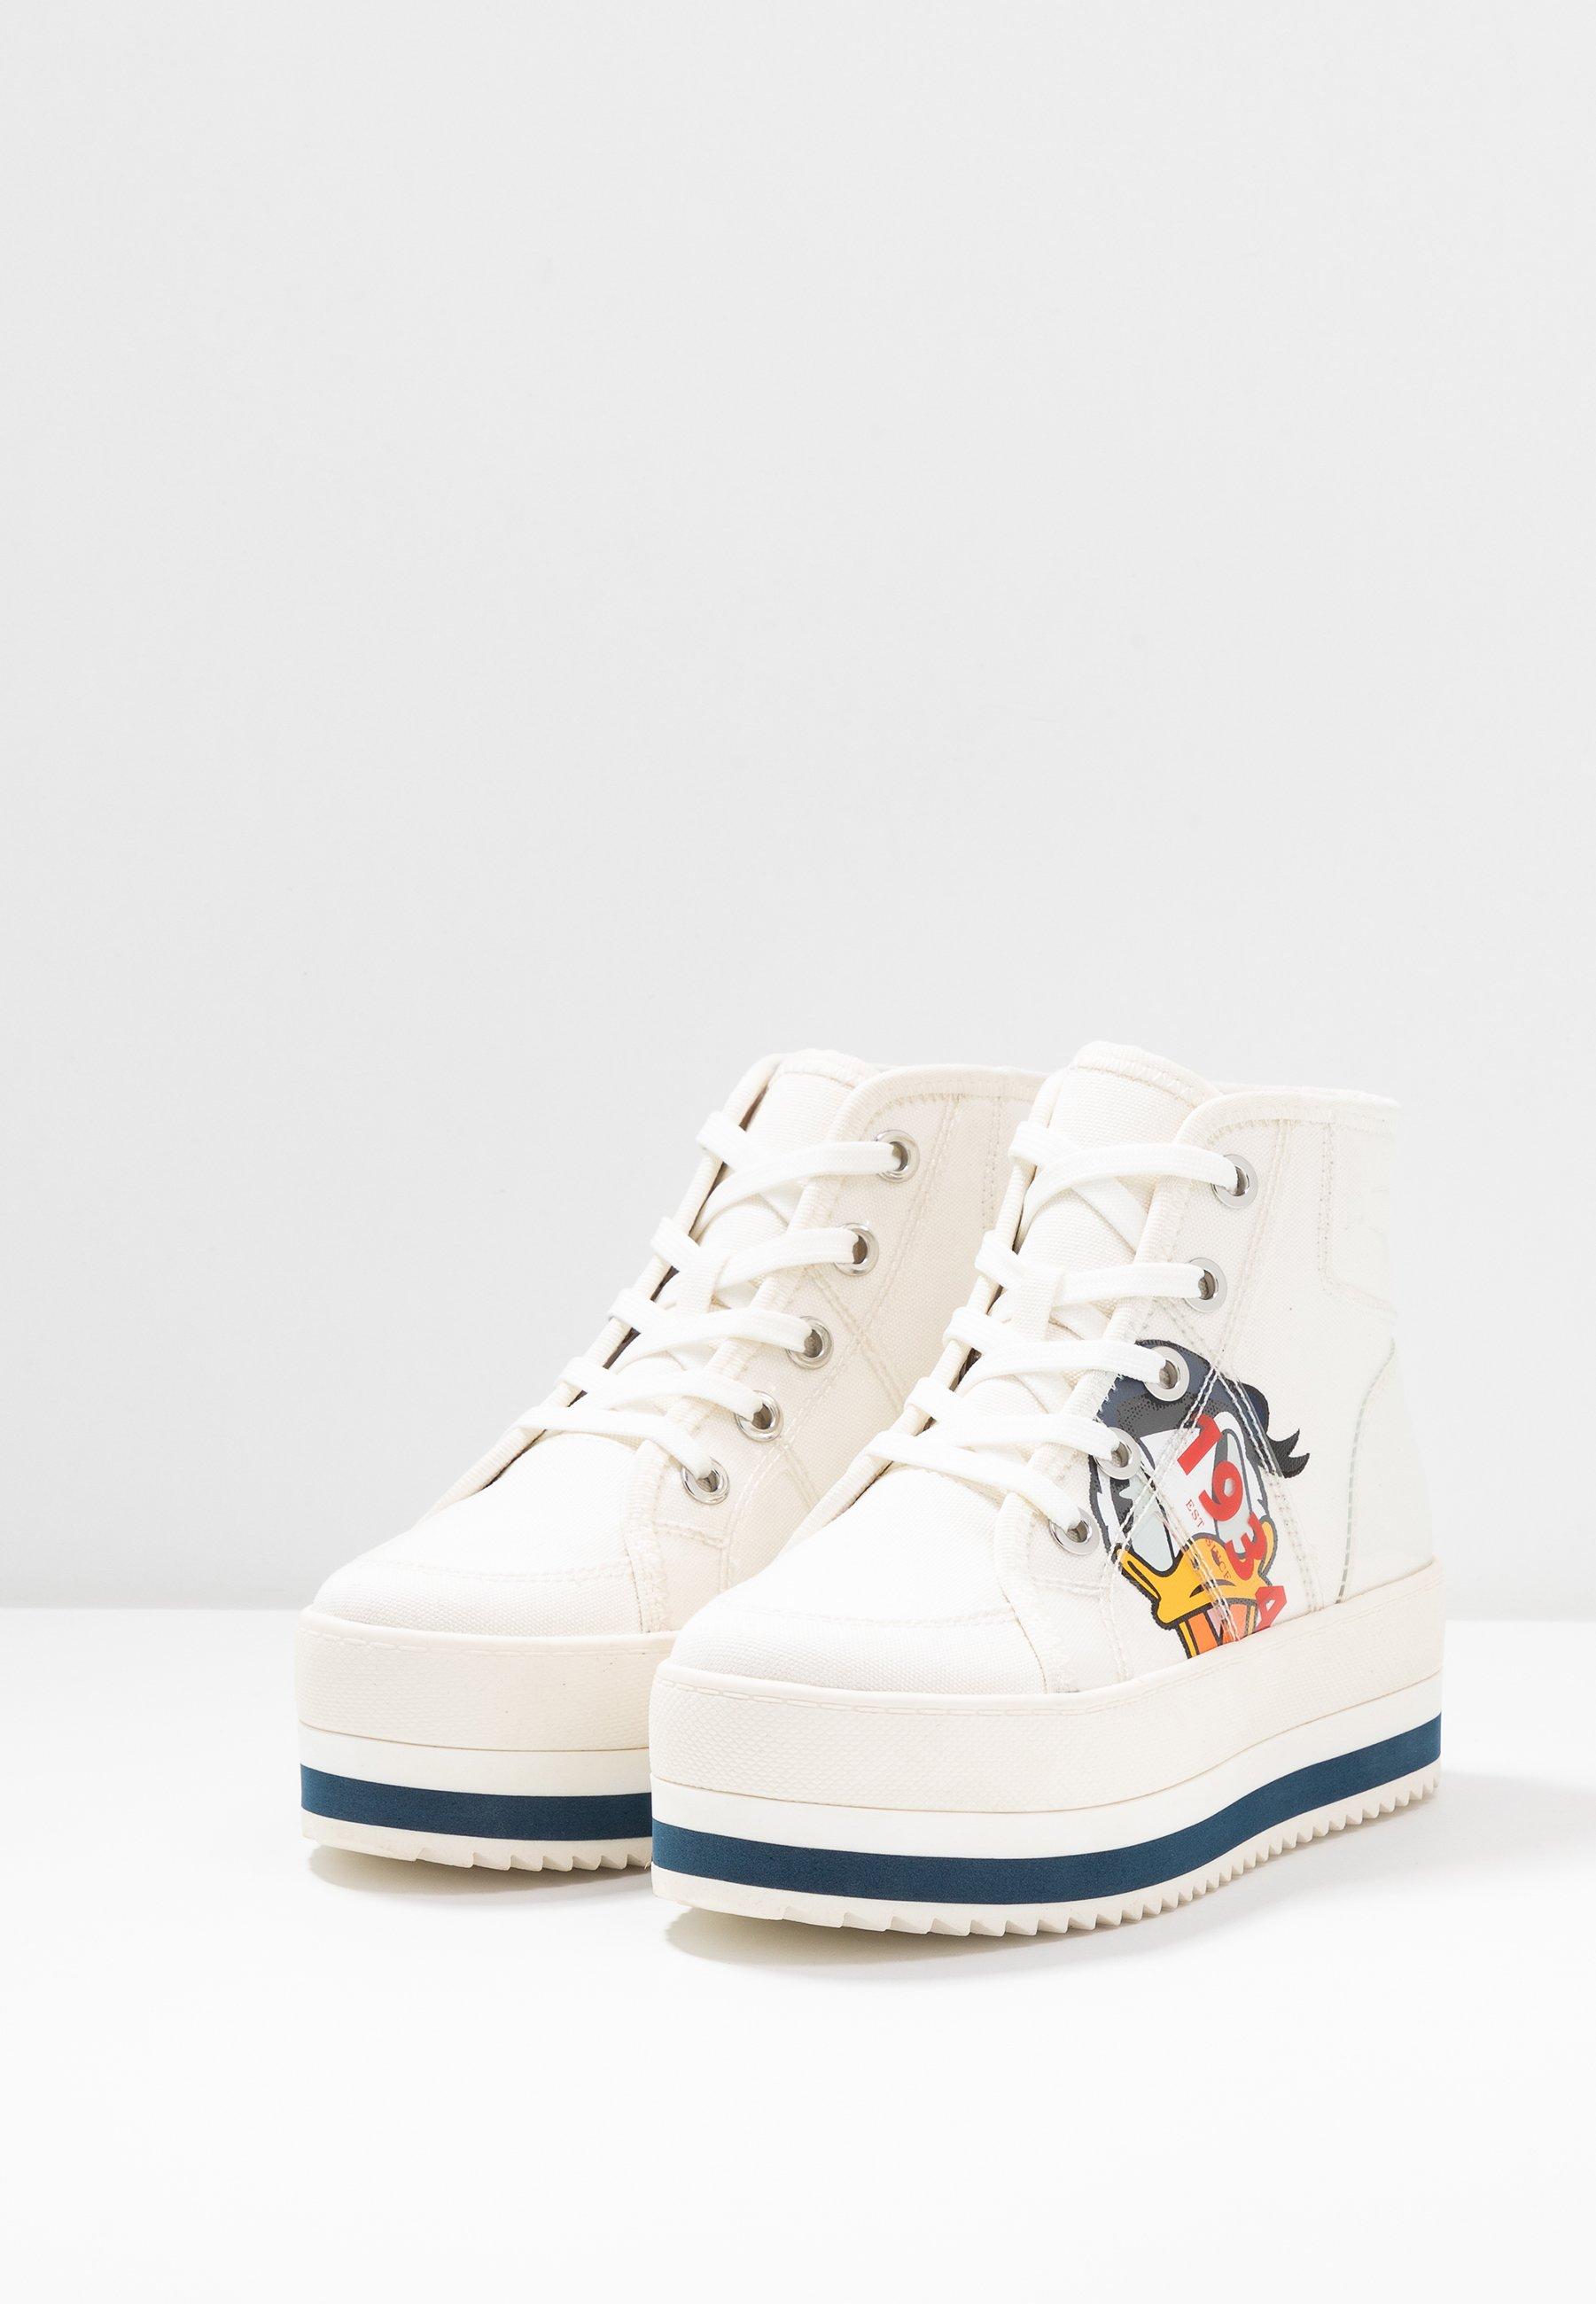 Call It Spring Seashore - Sneakers High White